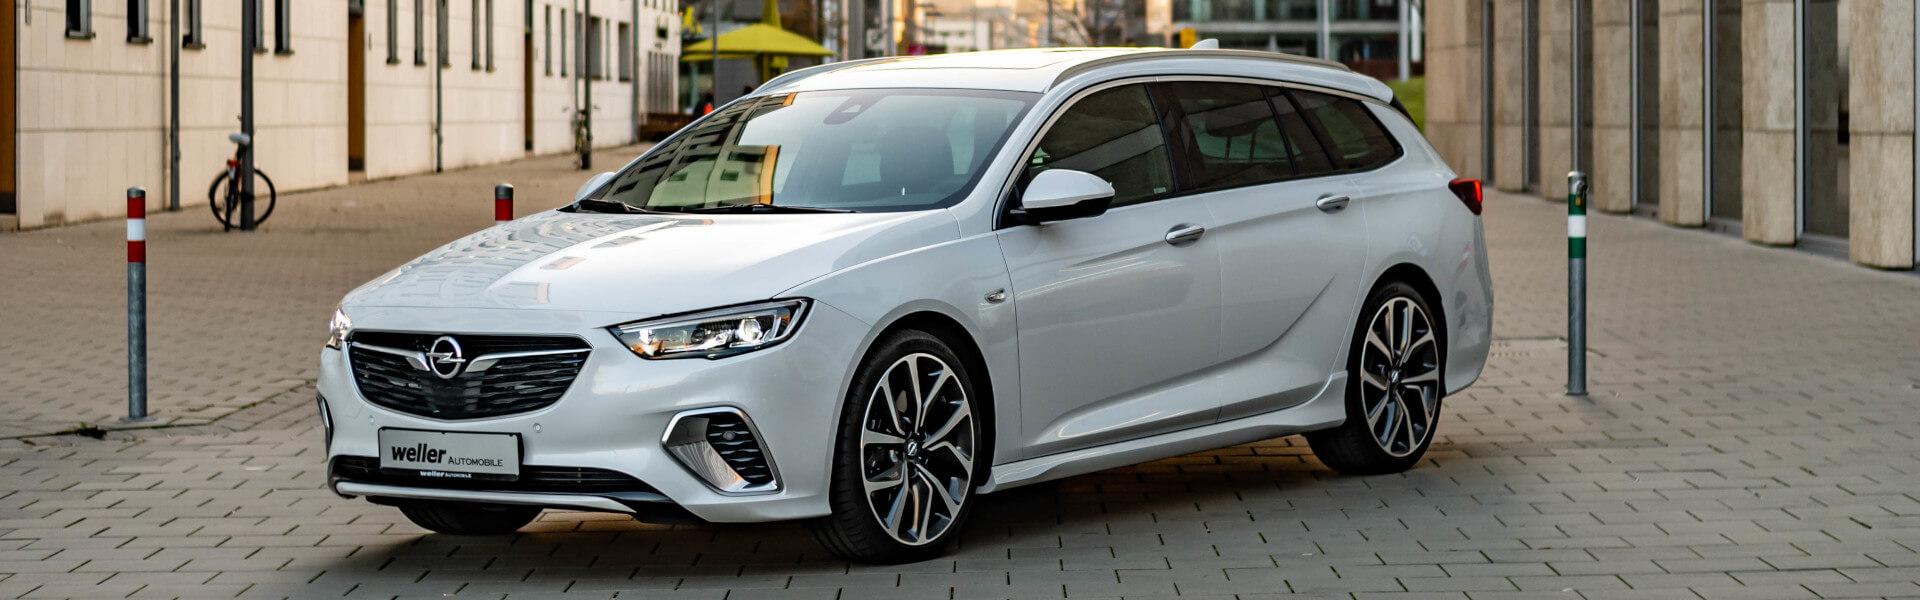 Opel Insignia Auto in weiß auf Straße